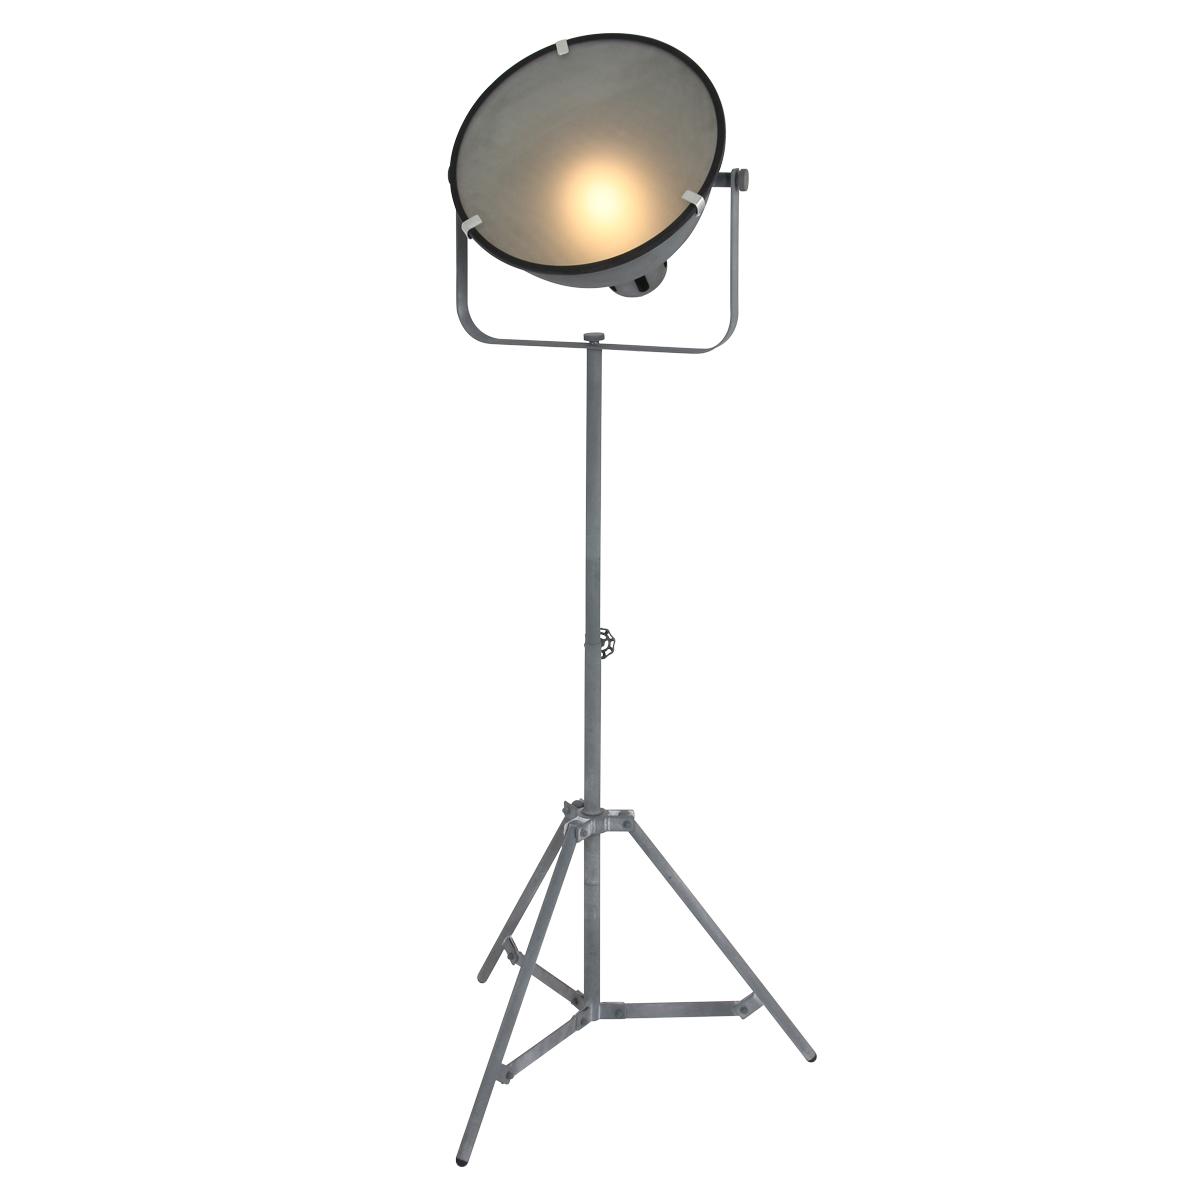 Dreibeinige Stehleuchte dreibeinige stehleuchte mexlite 1354gr - fabriklampe-online